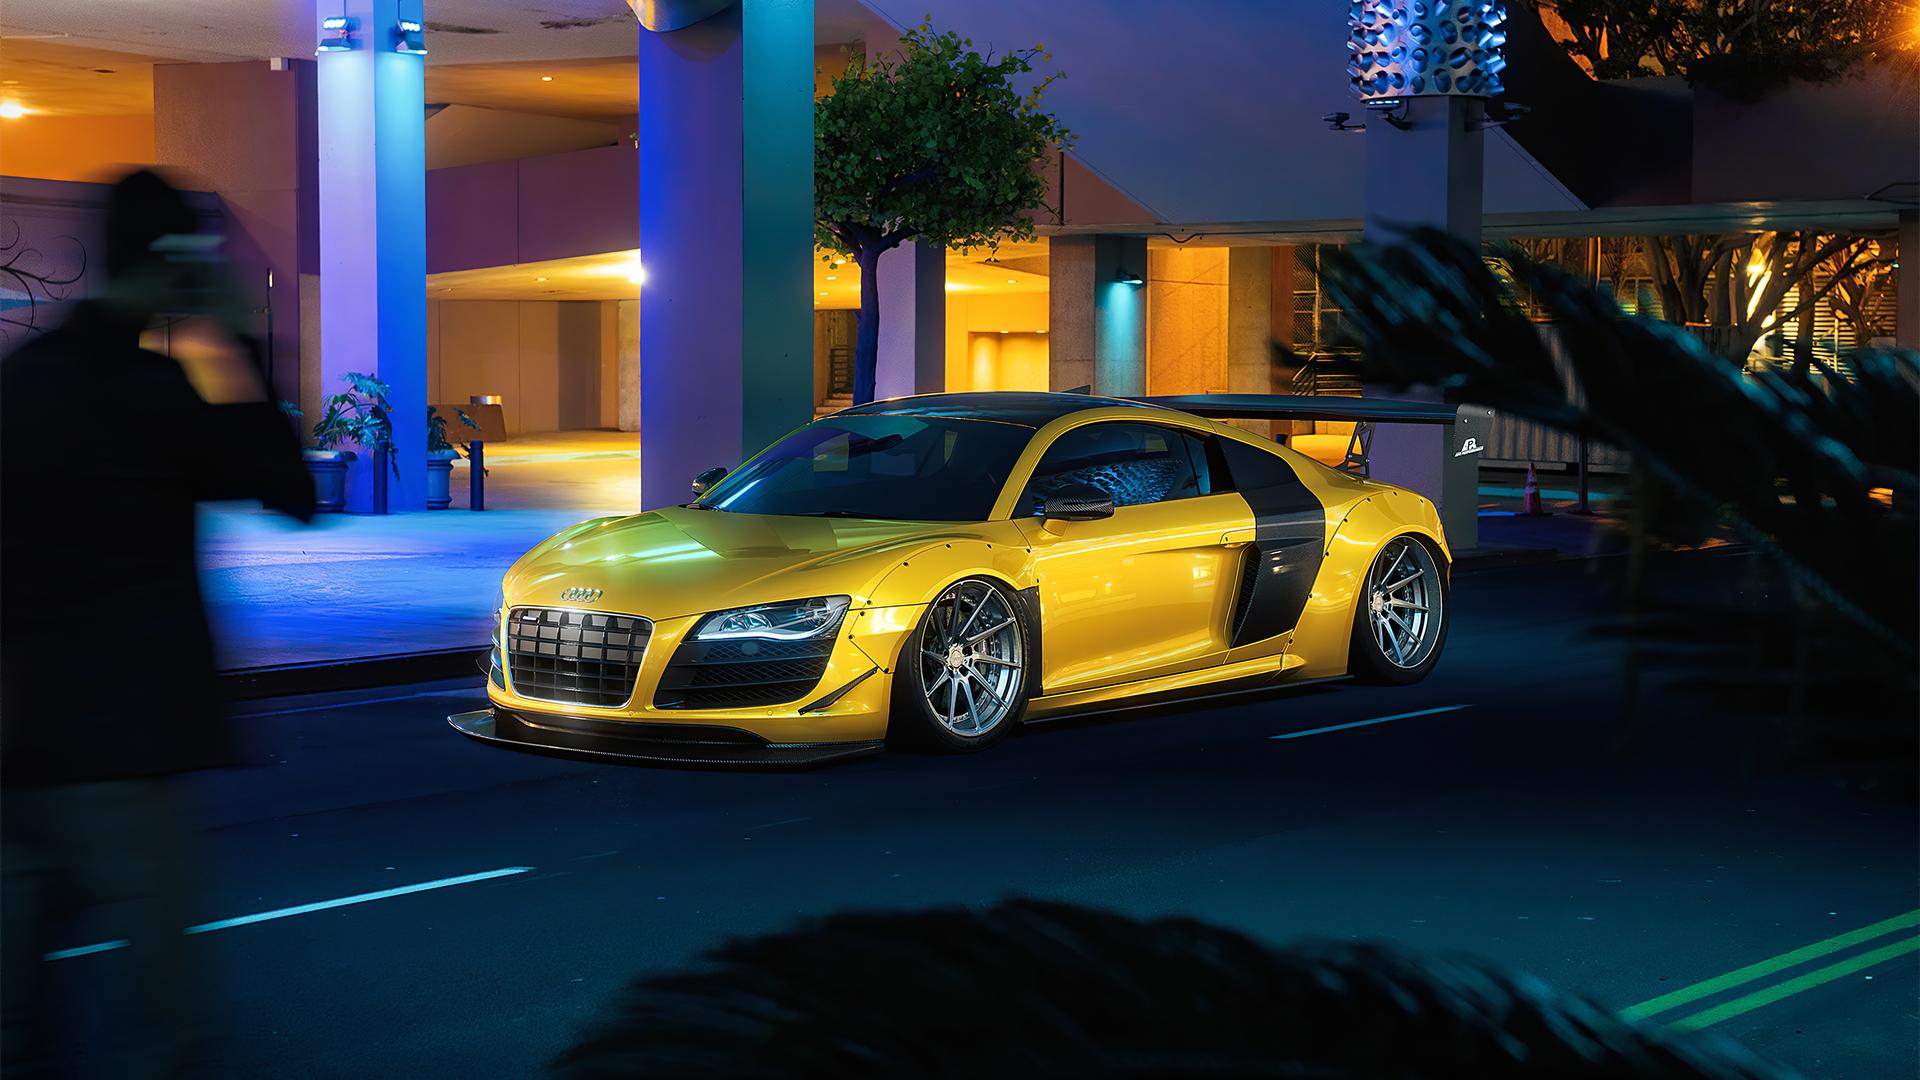 1920x1080 Yellow Audi R8 Car Laptop Full HD 1080P HD 4k ...